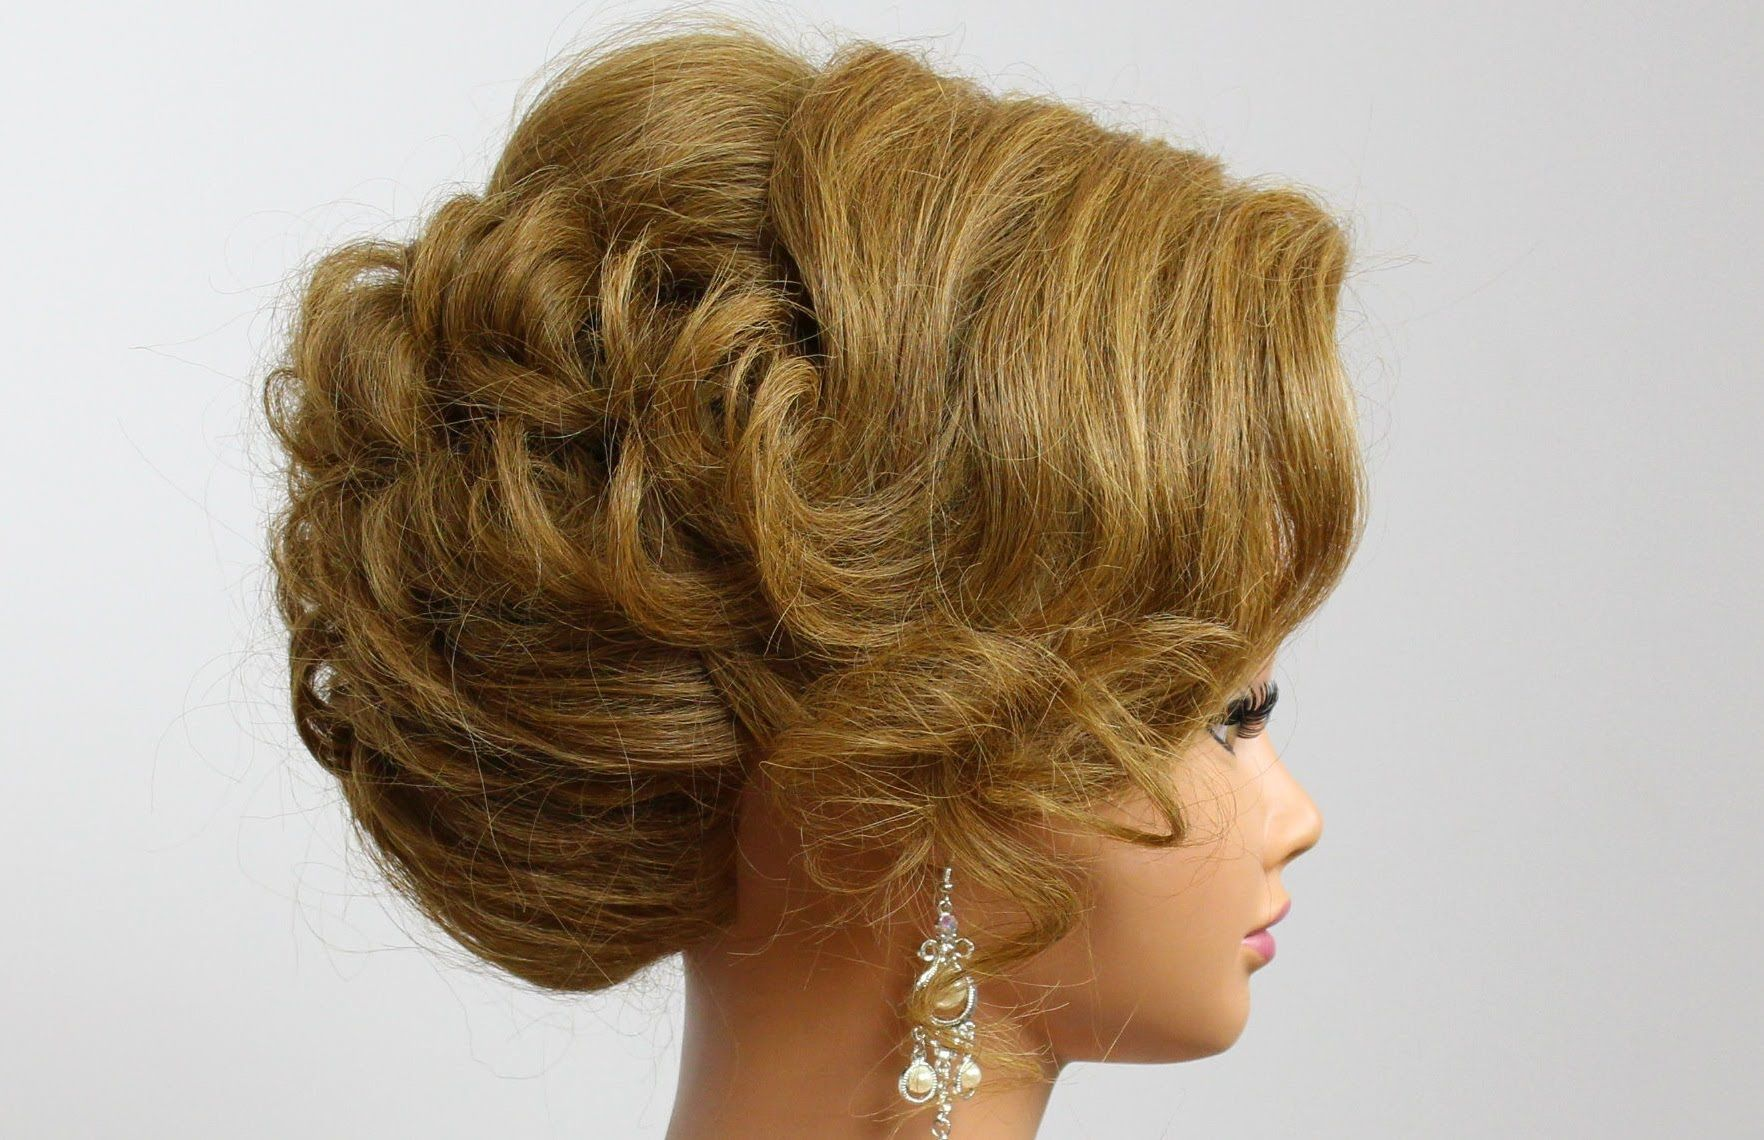 Bridal updo wedding hairstyle for medium hair medium hair